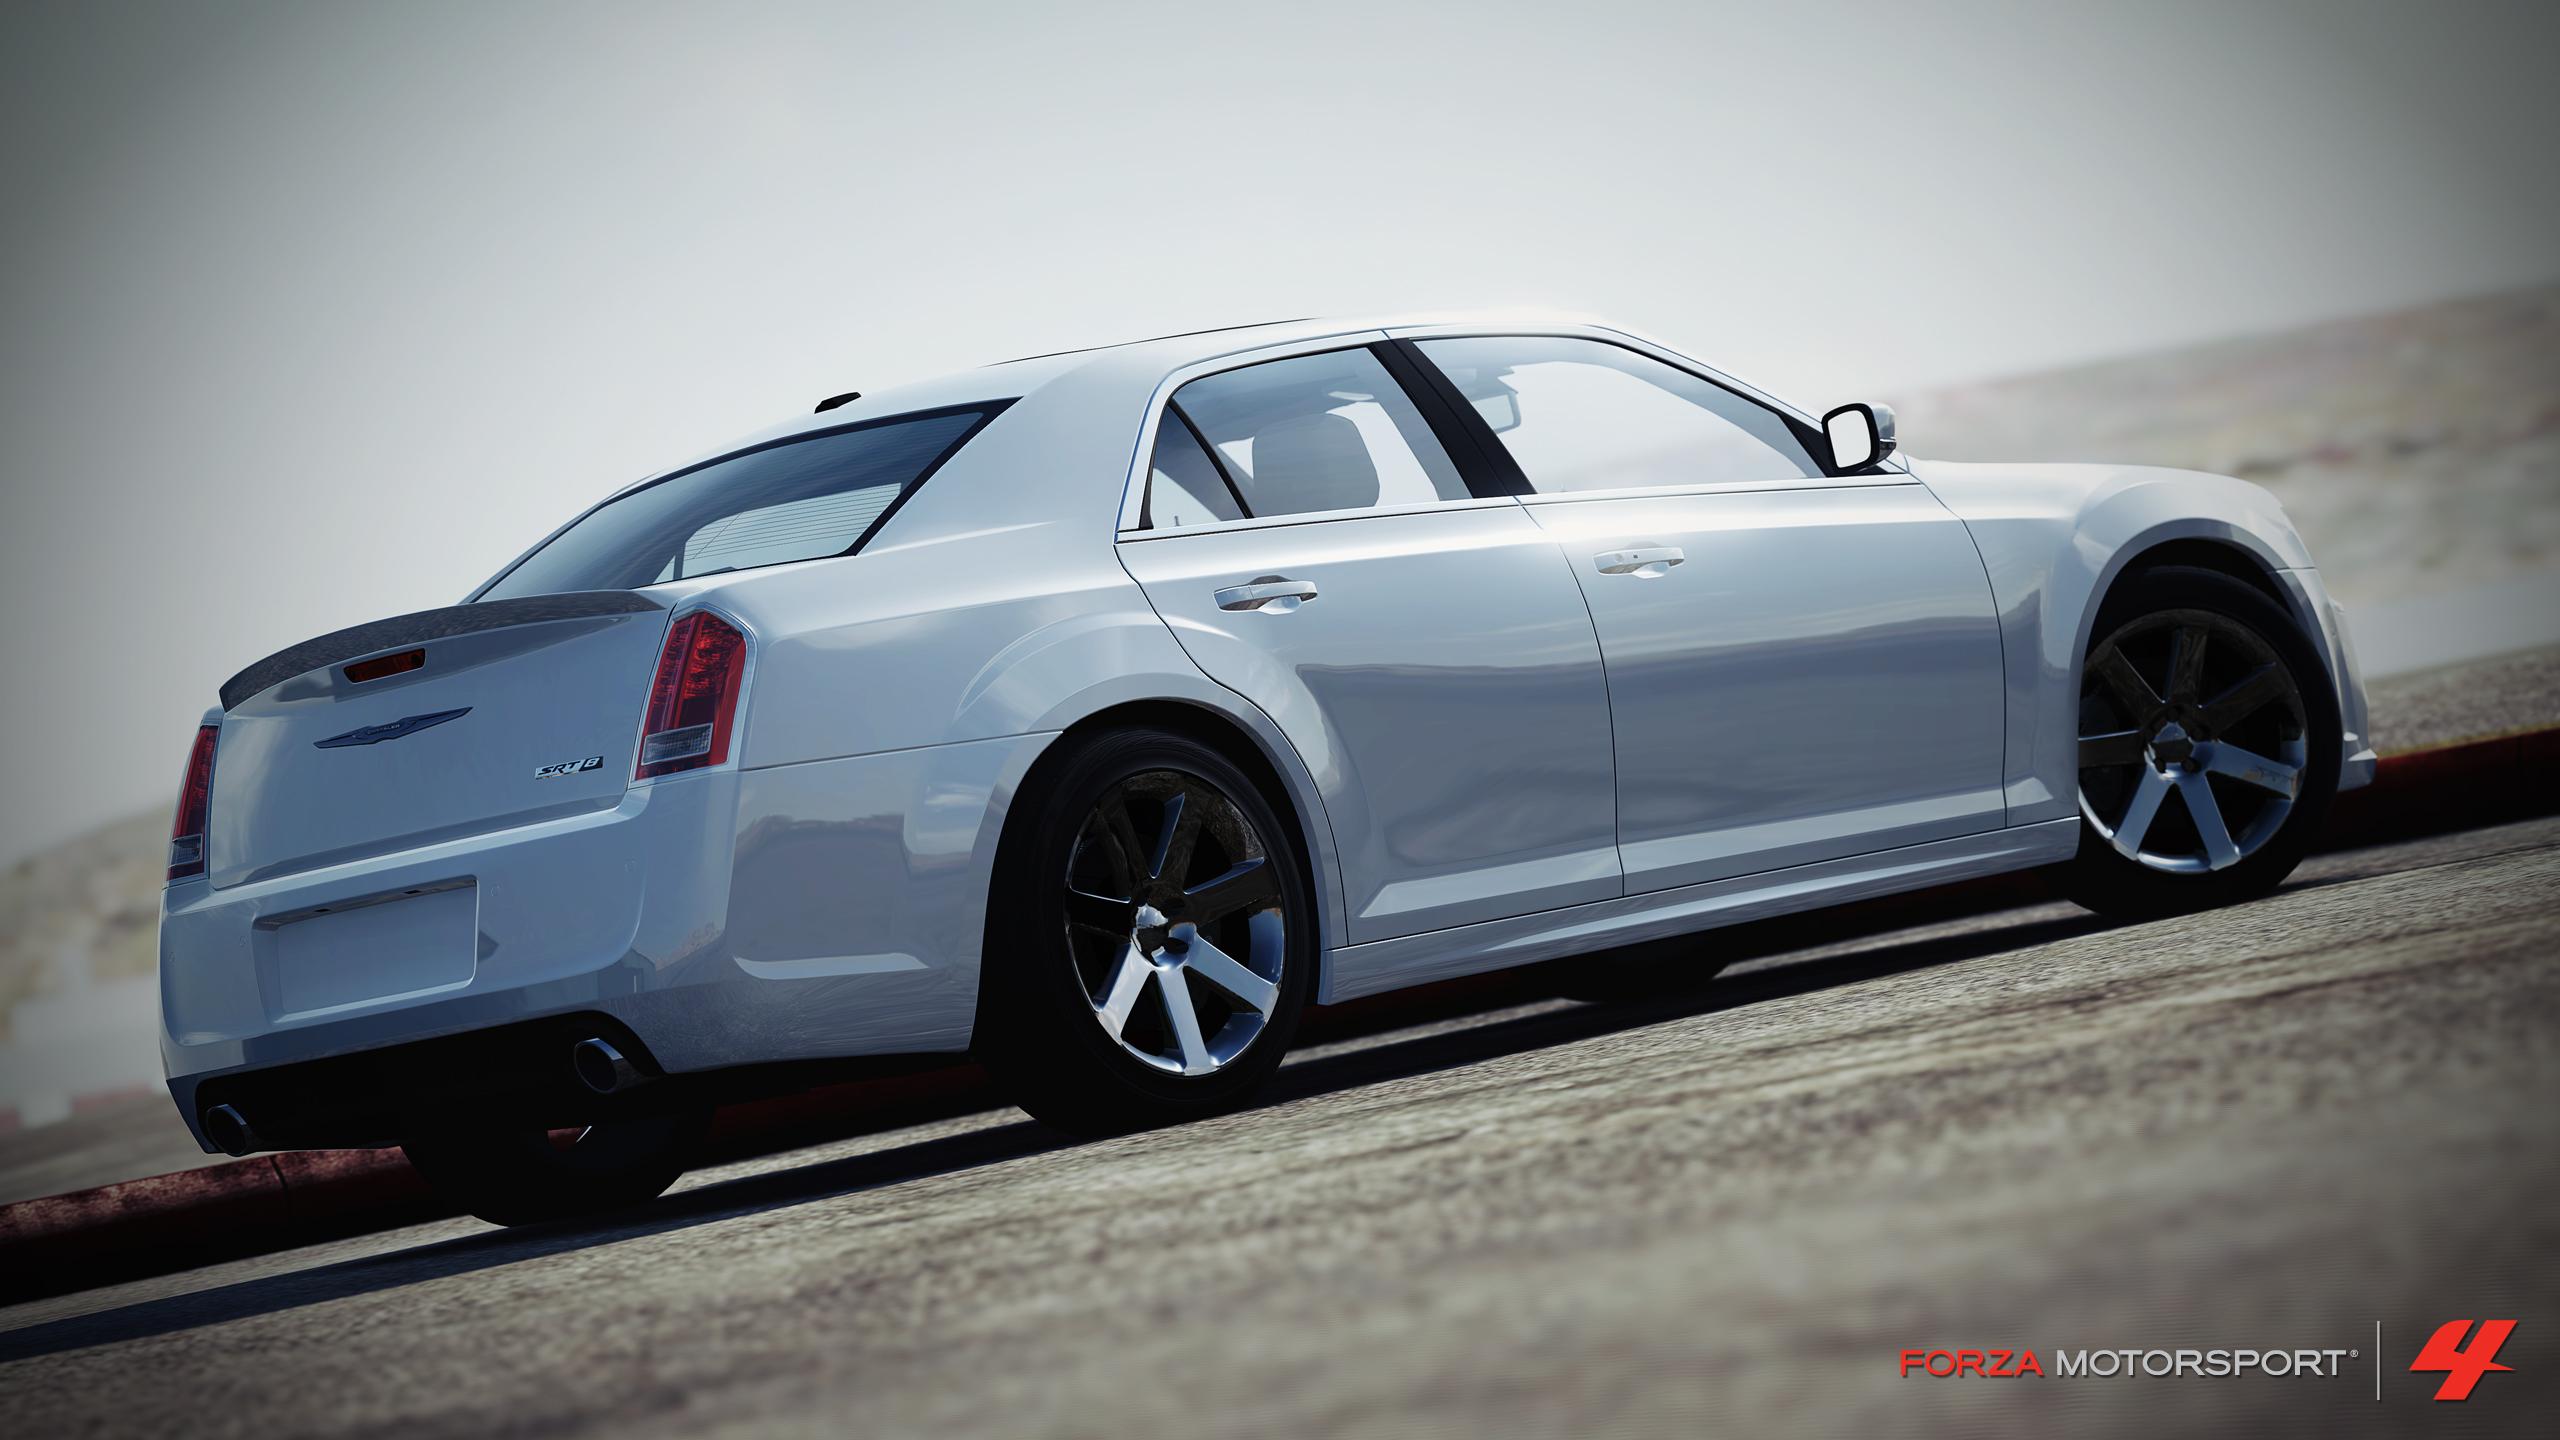 2012 chrysler 300 srt8 2 heyuguys. Cars Review. Best American Auto & Cars Review